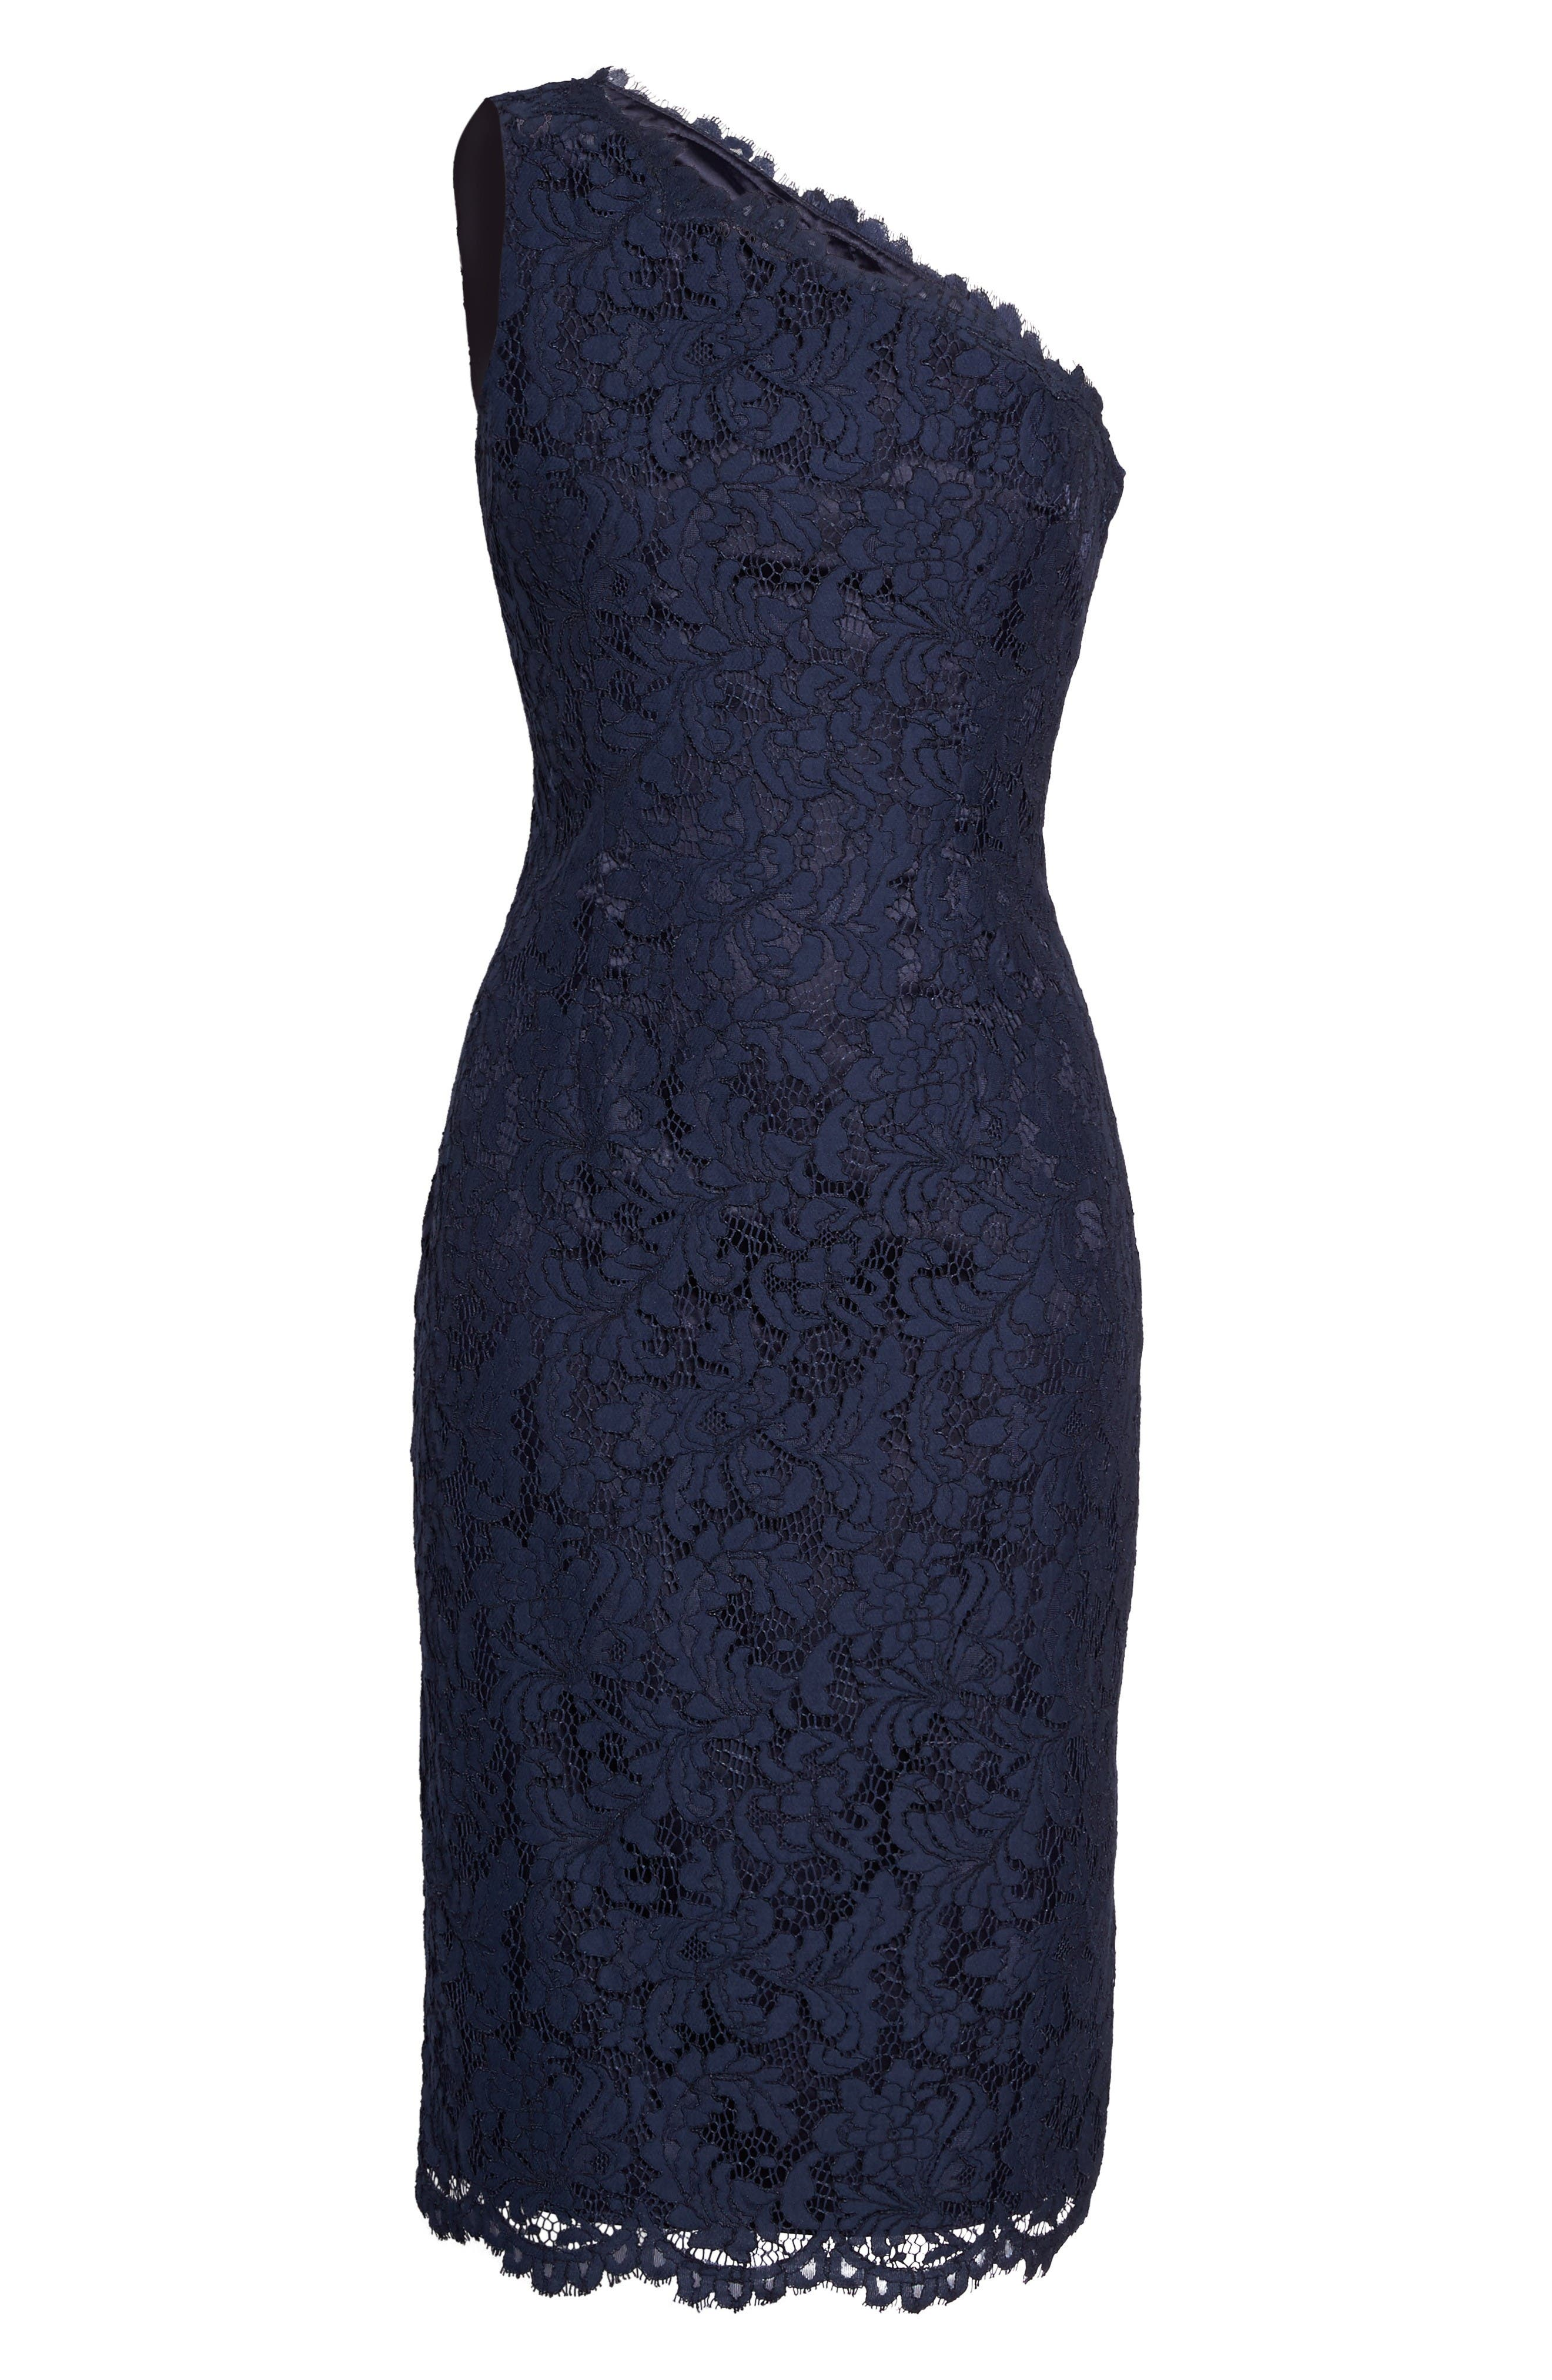 One-Shoulder Lace Dress,                             Alternate thumbnail 7, color,                             Navy